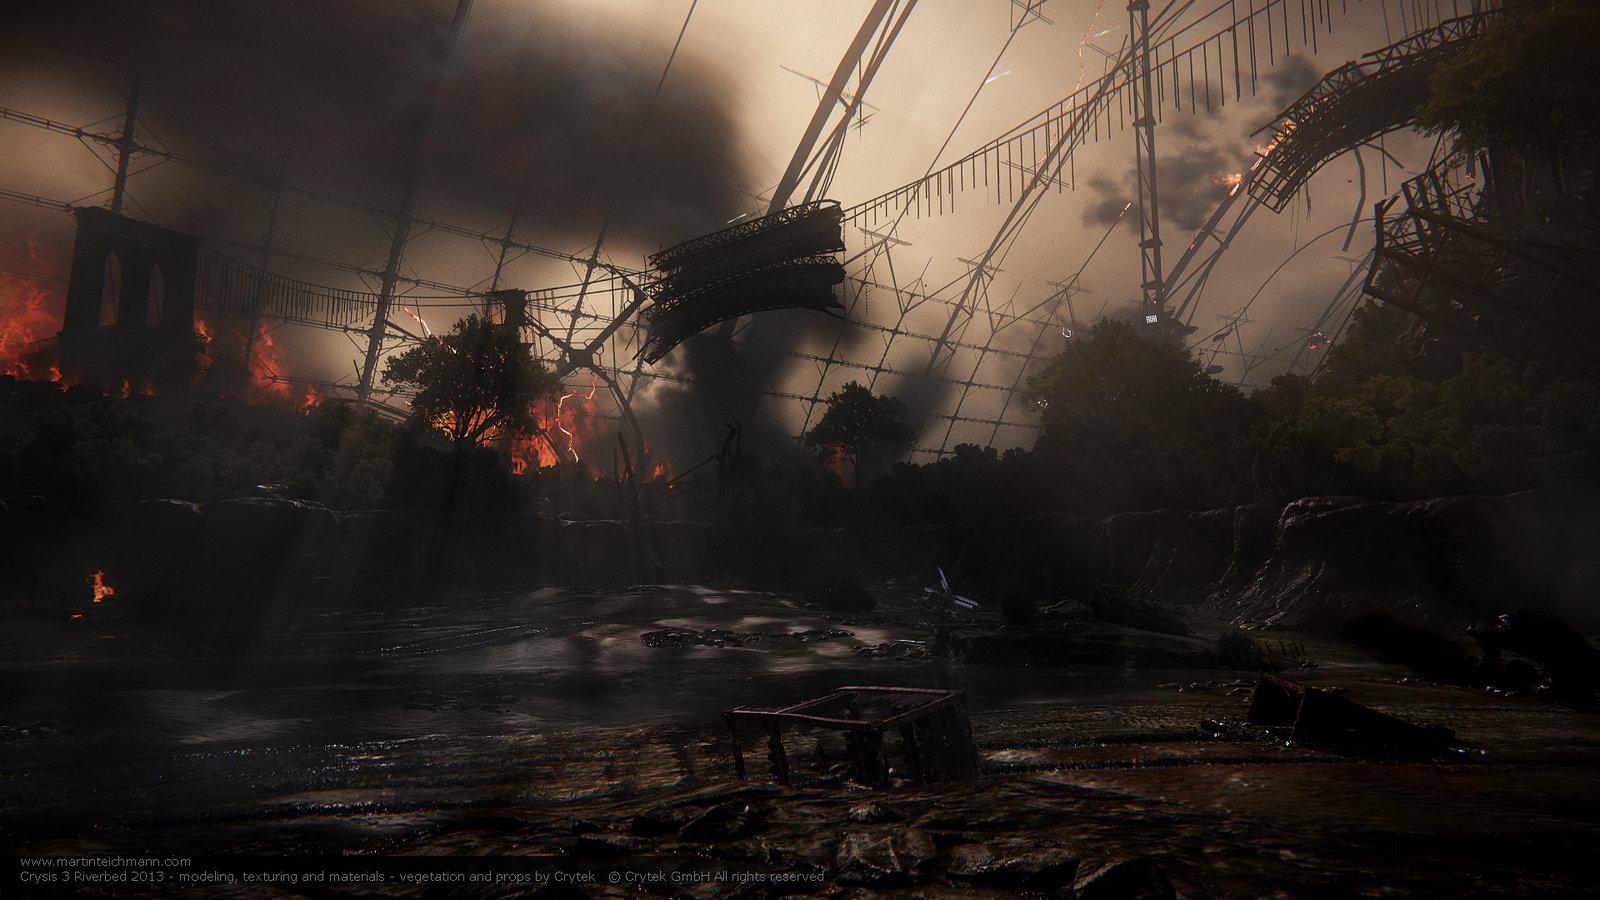 Crysis 3 Riverbed - Root of All Evil  ruined Brooklyn Bridge